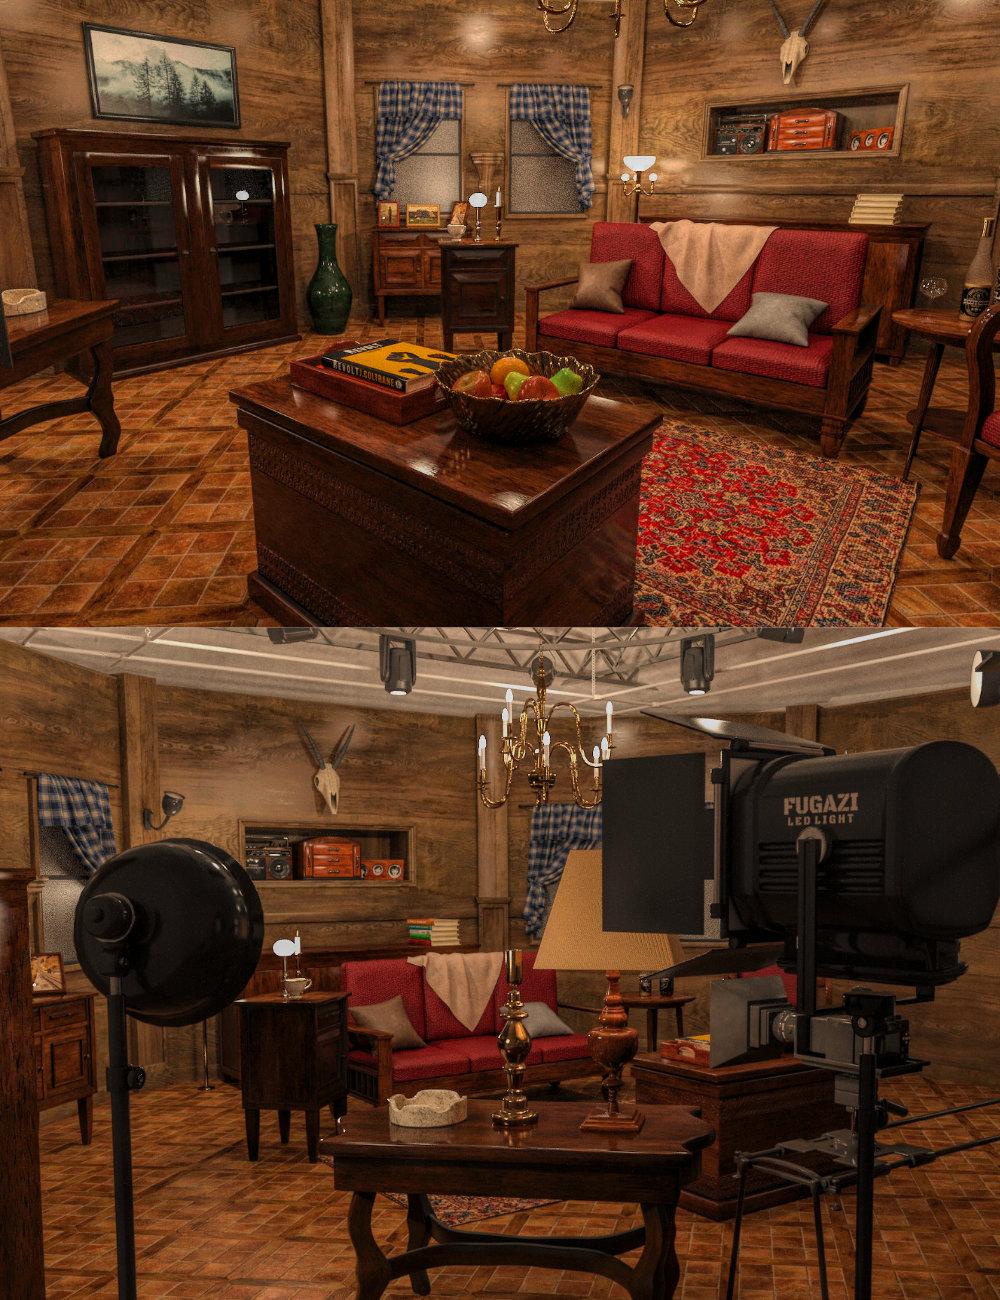 FG Movie Room by: Fugazi1968PAN StudiosIronman, 3D Models by Daz 3D